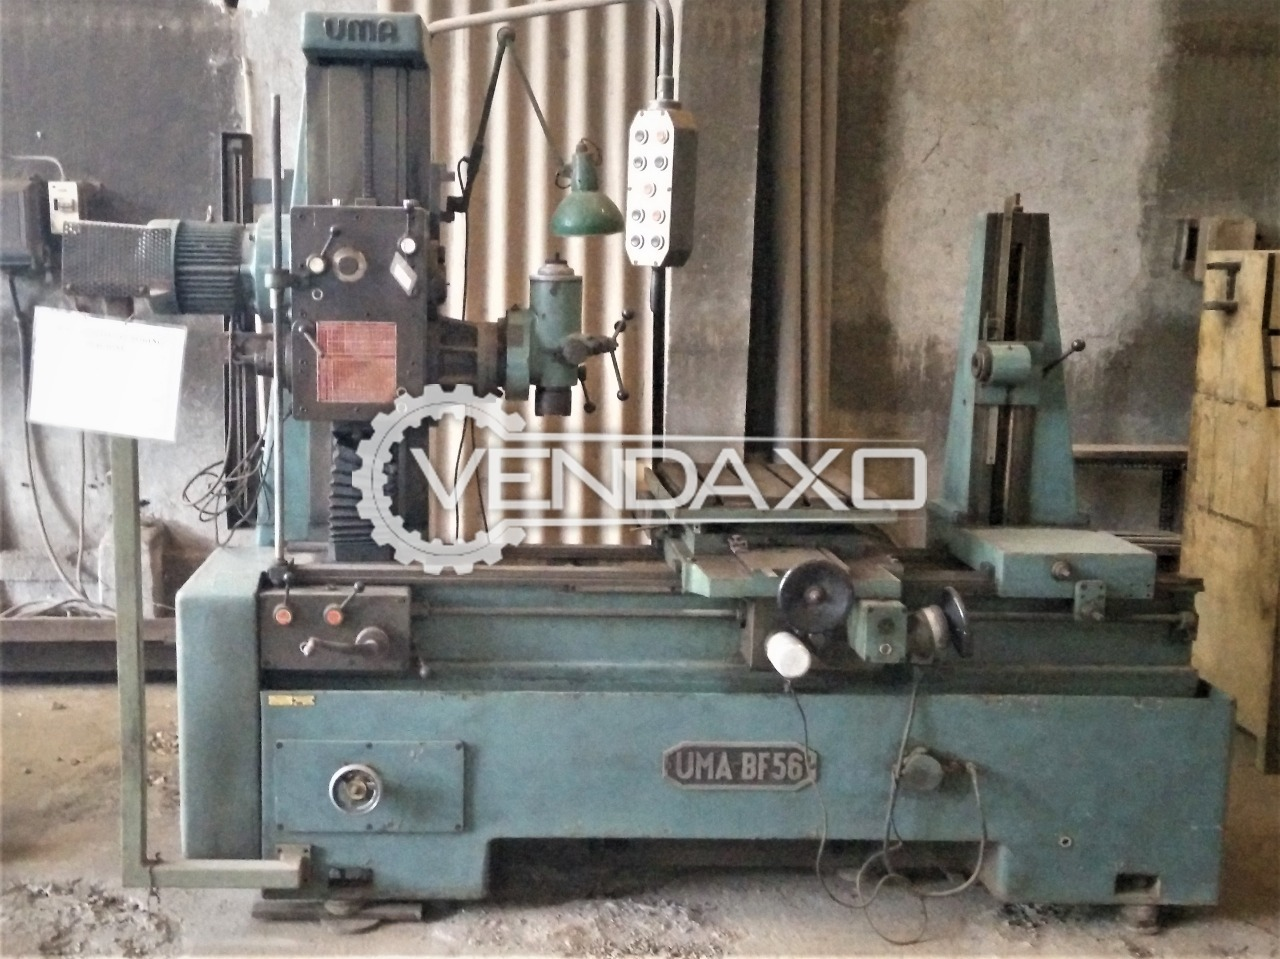 UMA BF-56 Horizontal Boring and Milling Machine